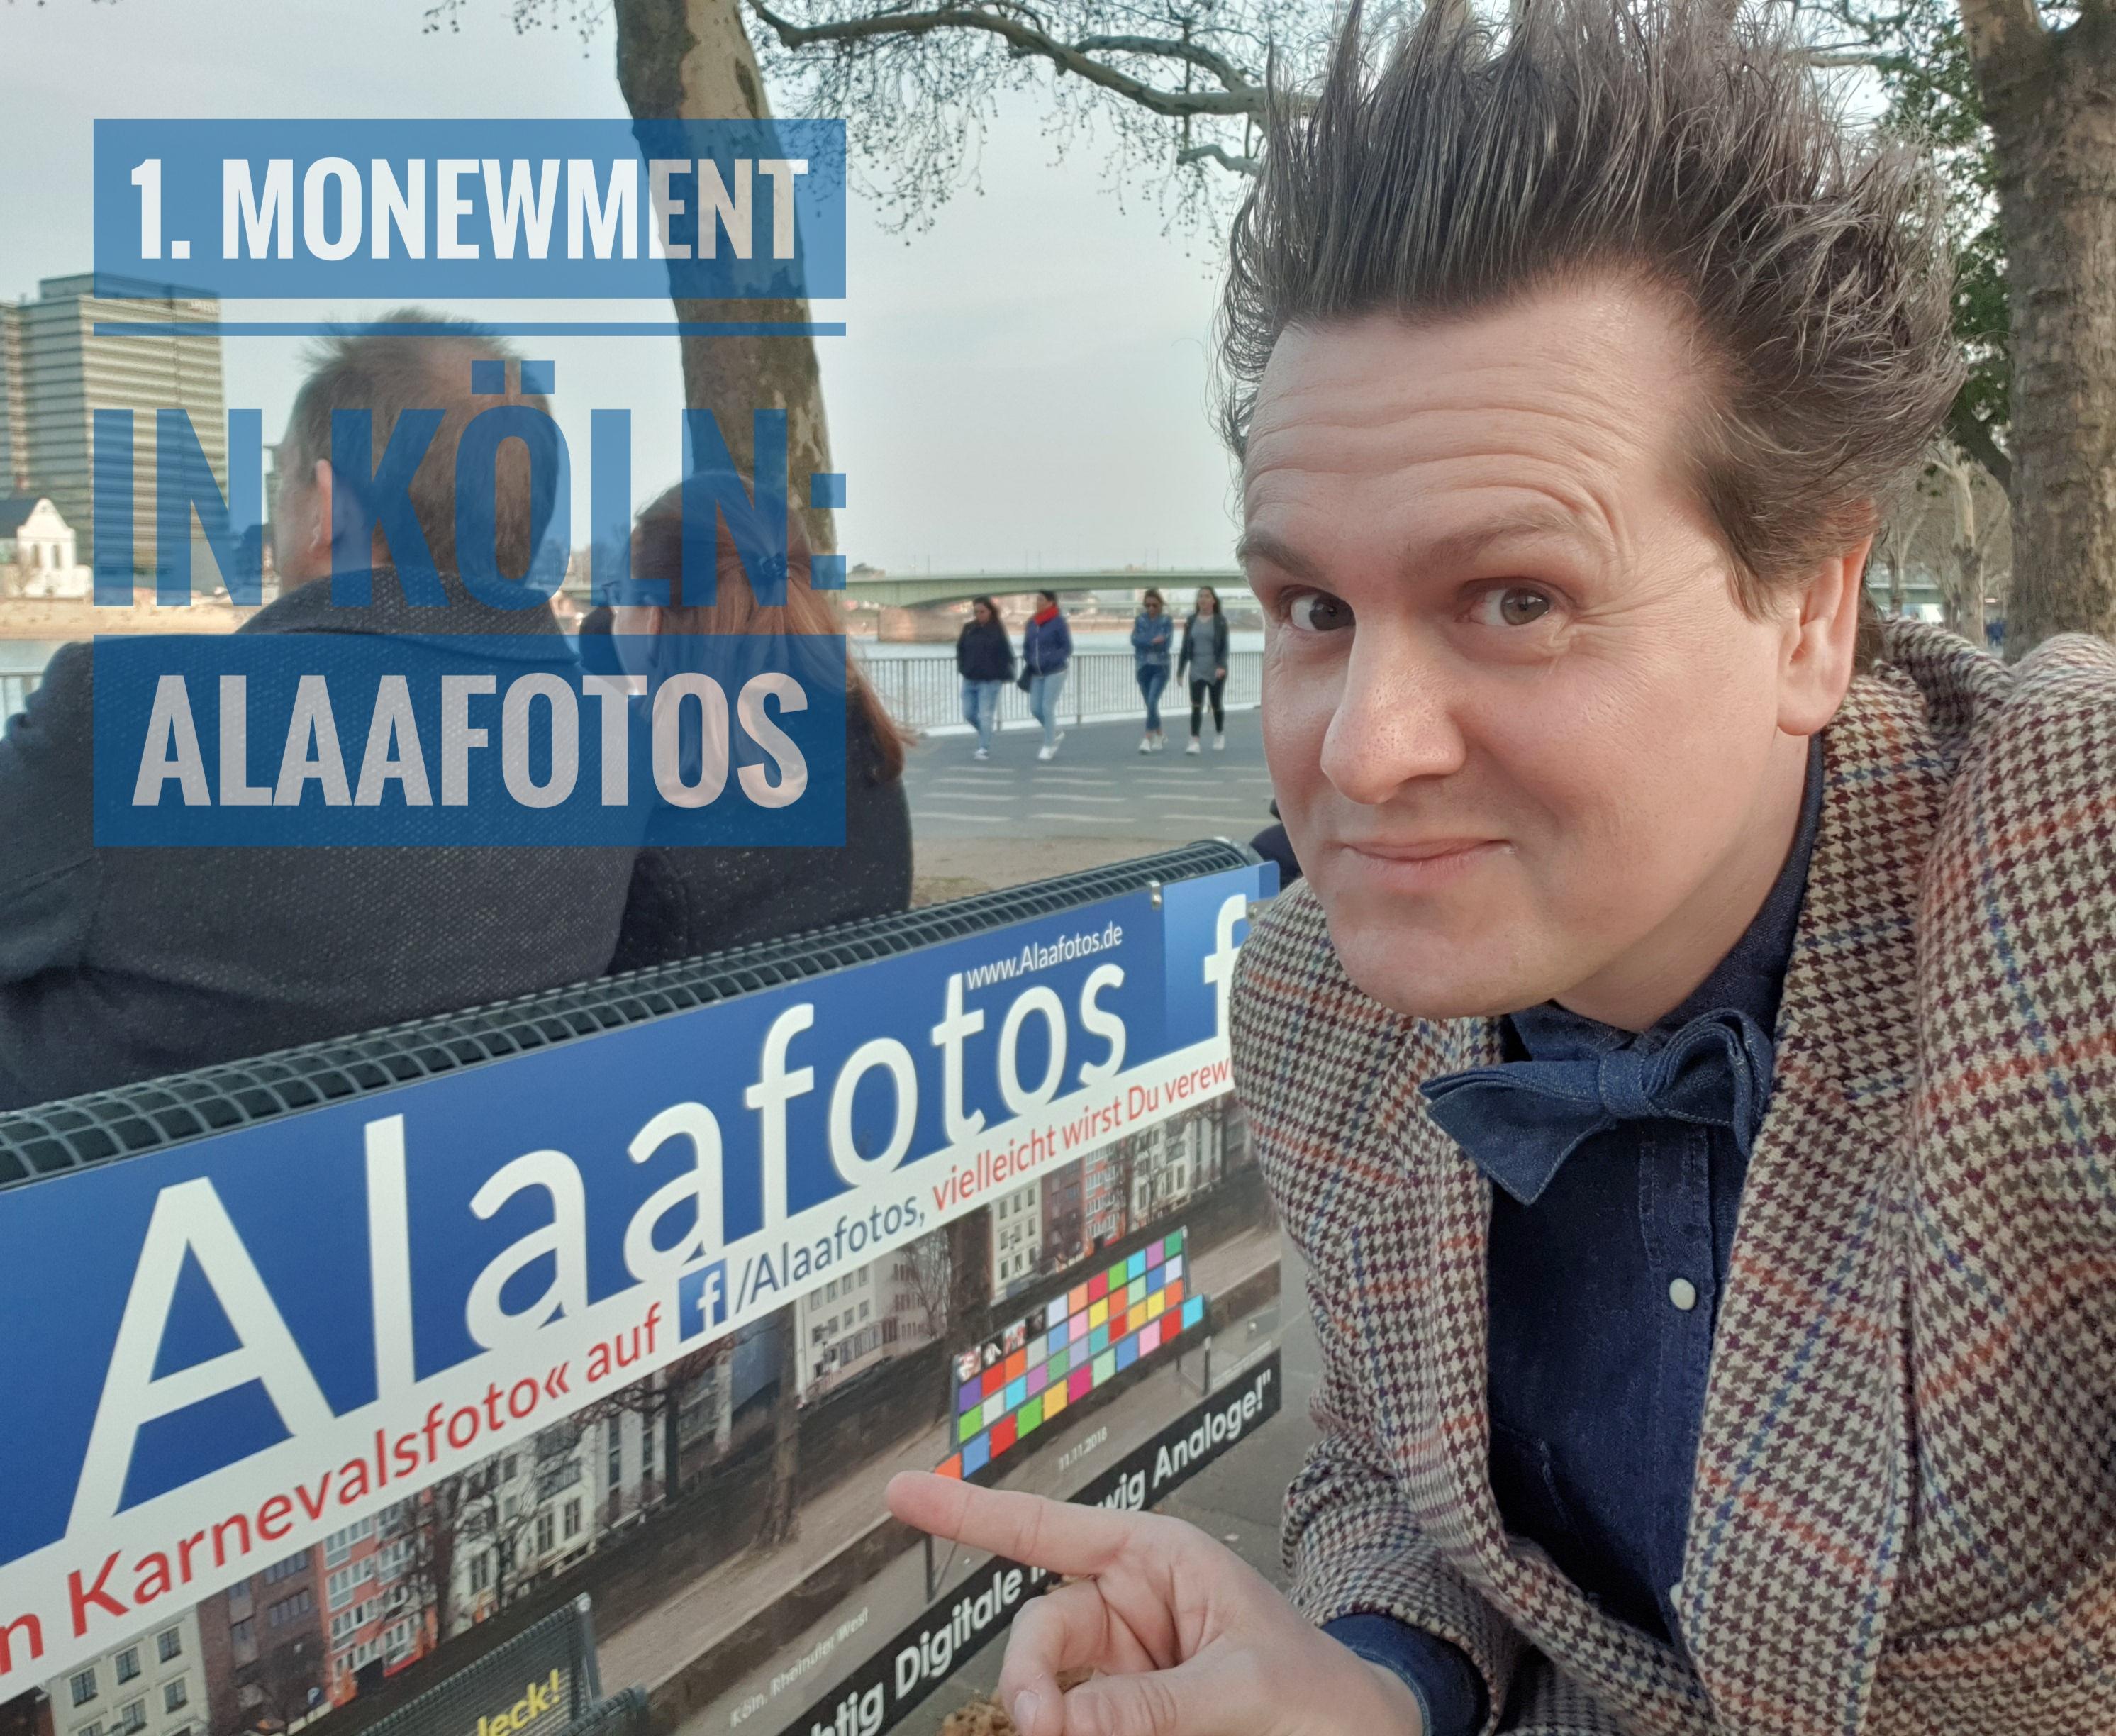 Monewment Alaafotos